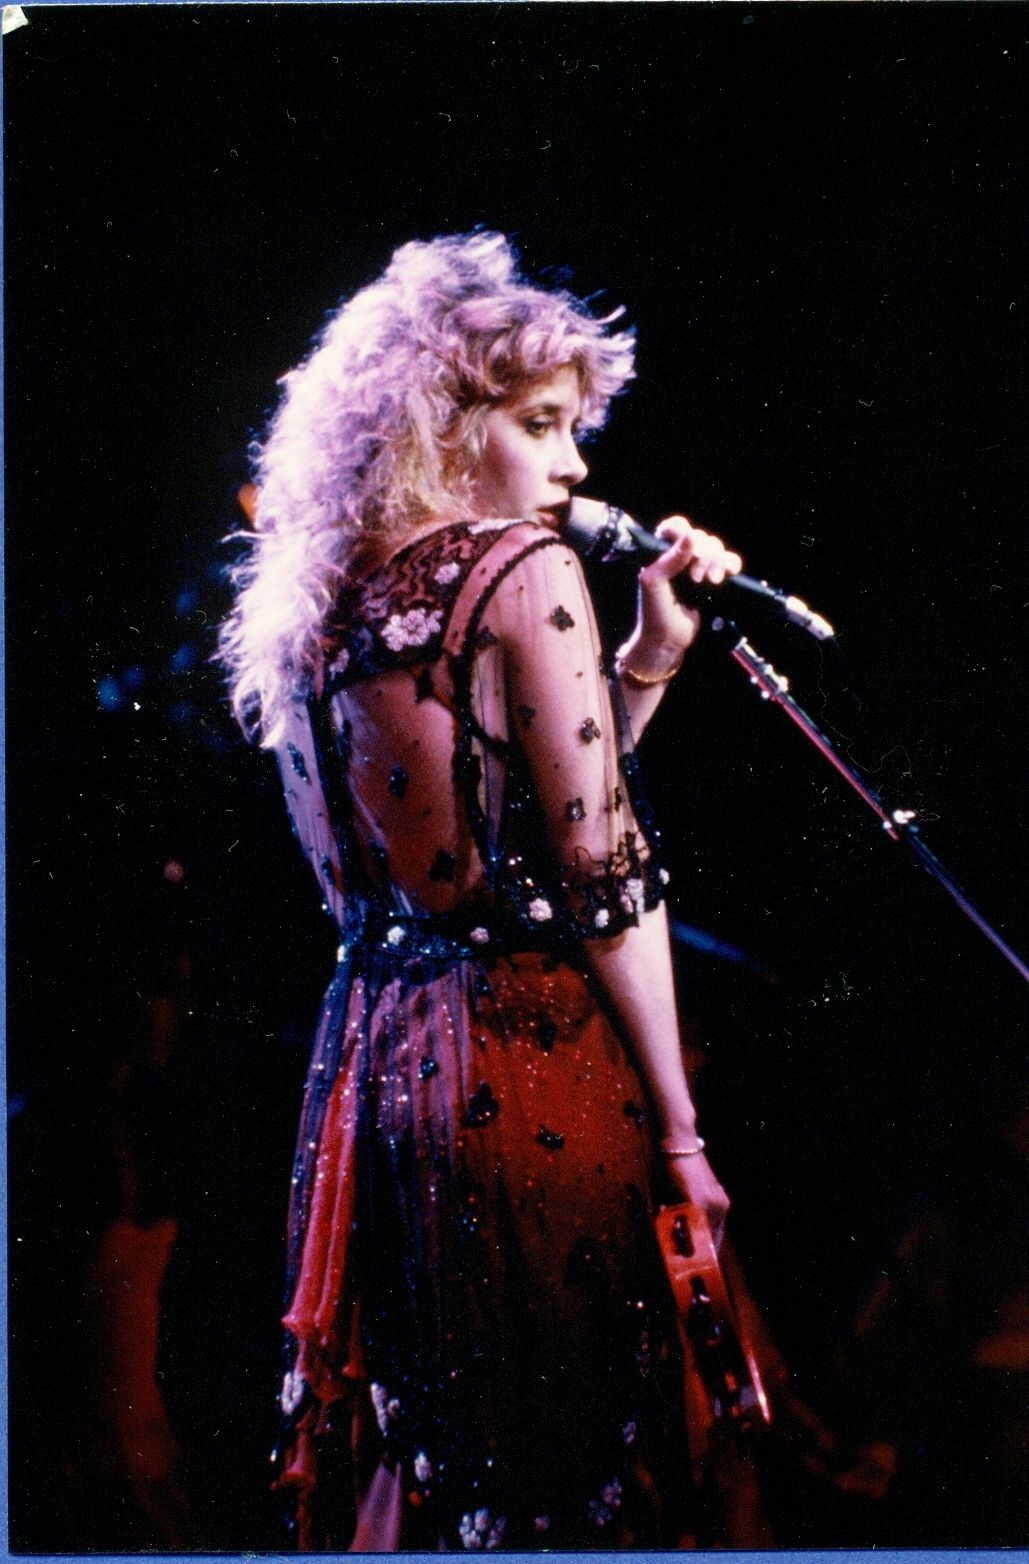 Stevie Stevie Nicks Photo 21187318 Fanpop Stevie Nicks Stevie Nicks Fleetwood Mac Stevie [ 1564 x 1029 Pixel ]